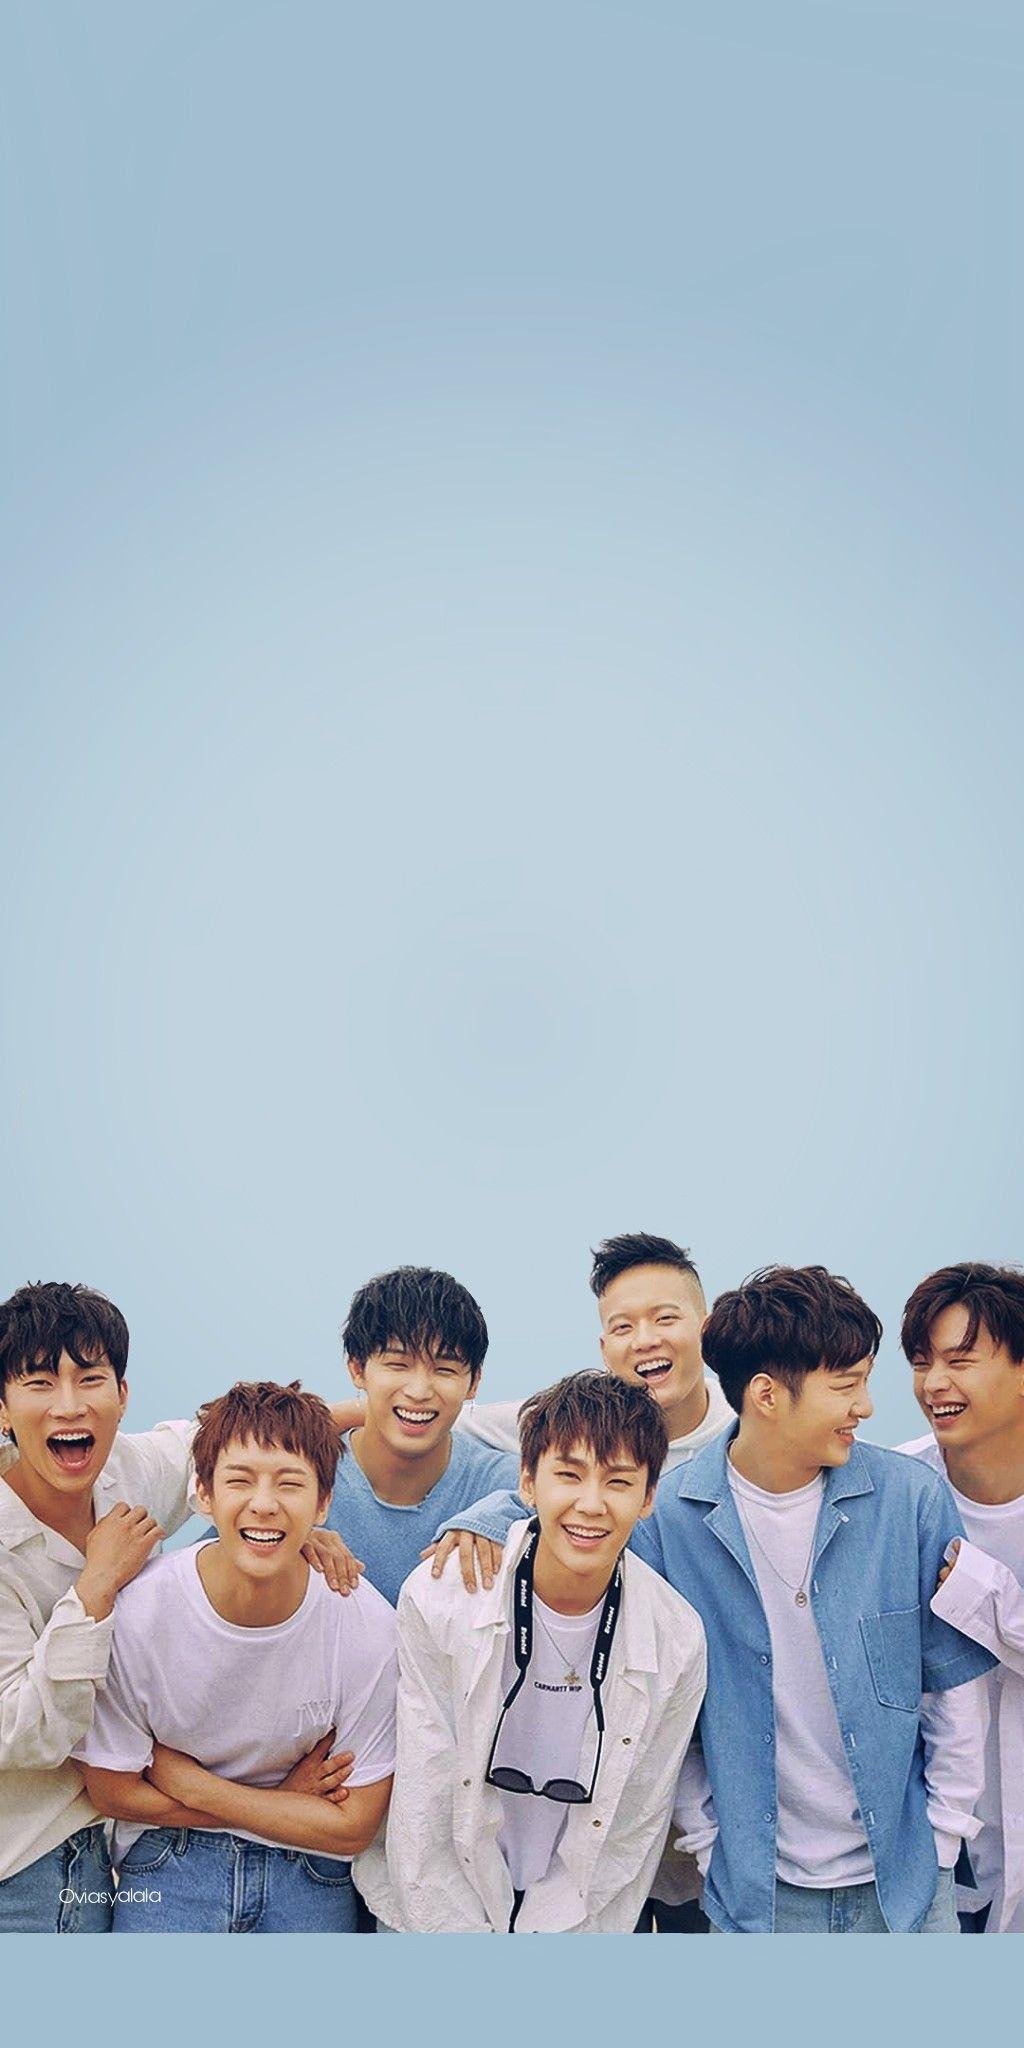 Btob This Is Us Wallpaper For Melody Btob This Is Us Kpop Entertainment Lee Min Lee